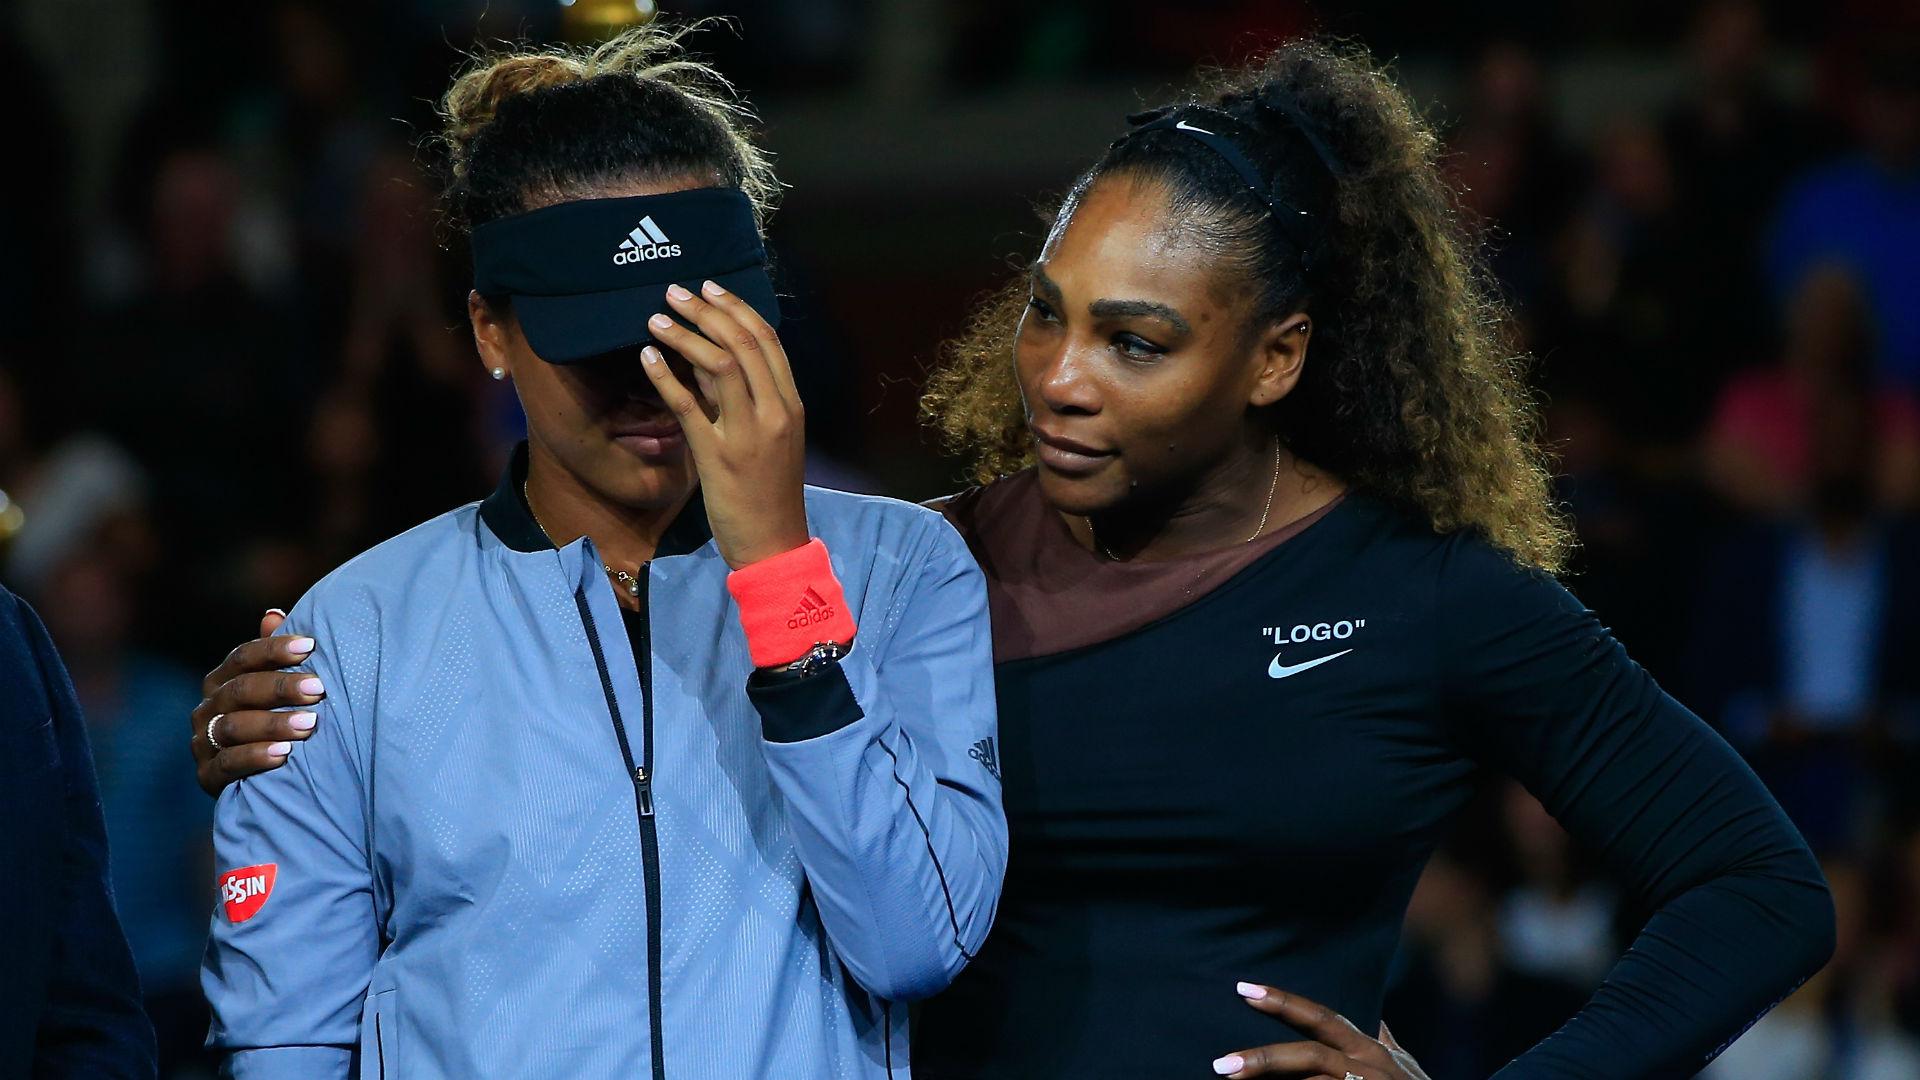 US Open 2018: USTA president hails Serena Williams' post-match 'class', despite umpire row ...